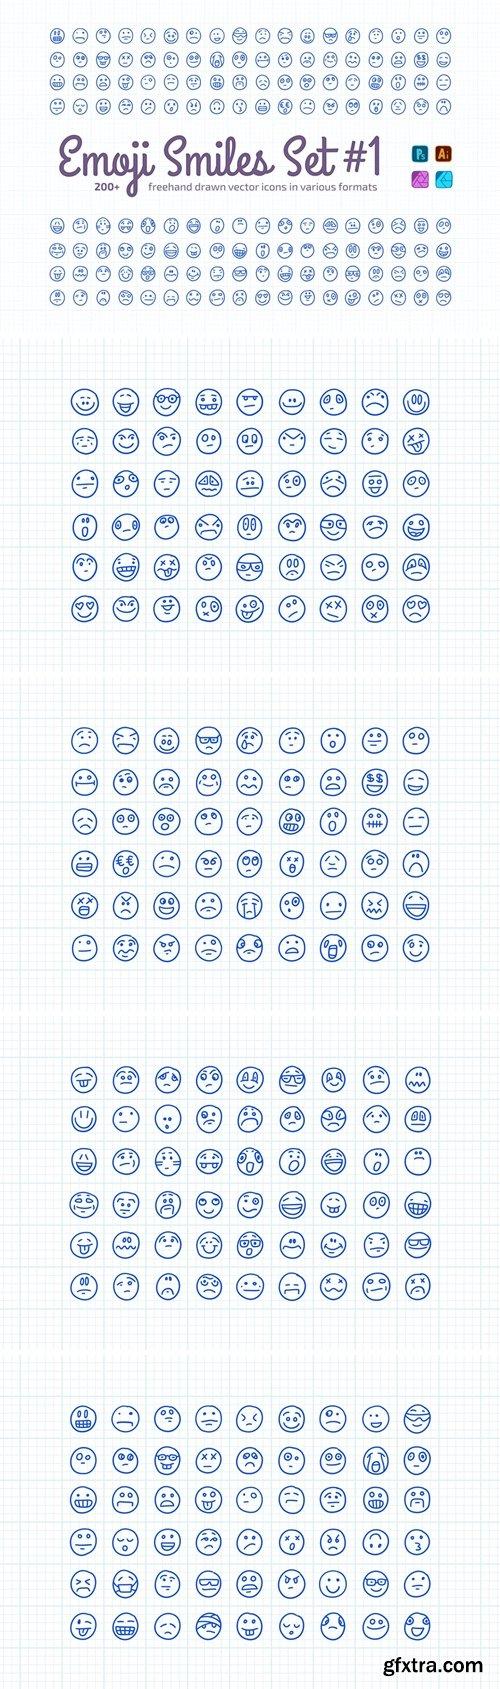 Freehand Drawn Emoji Smiles Set #1